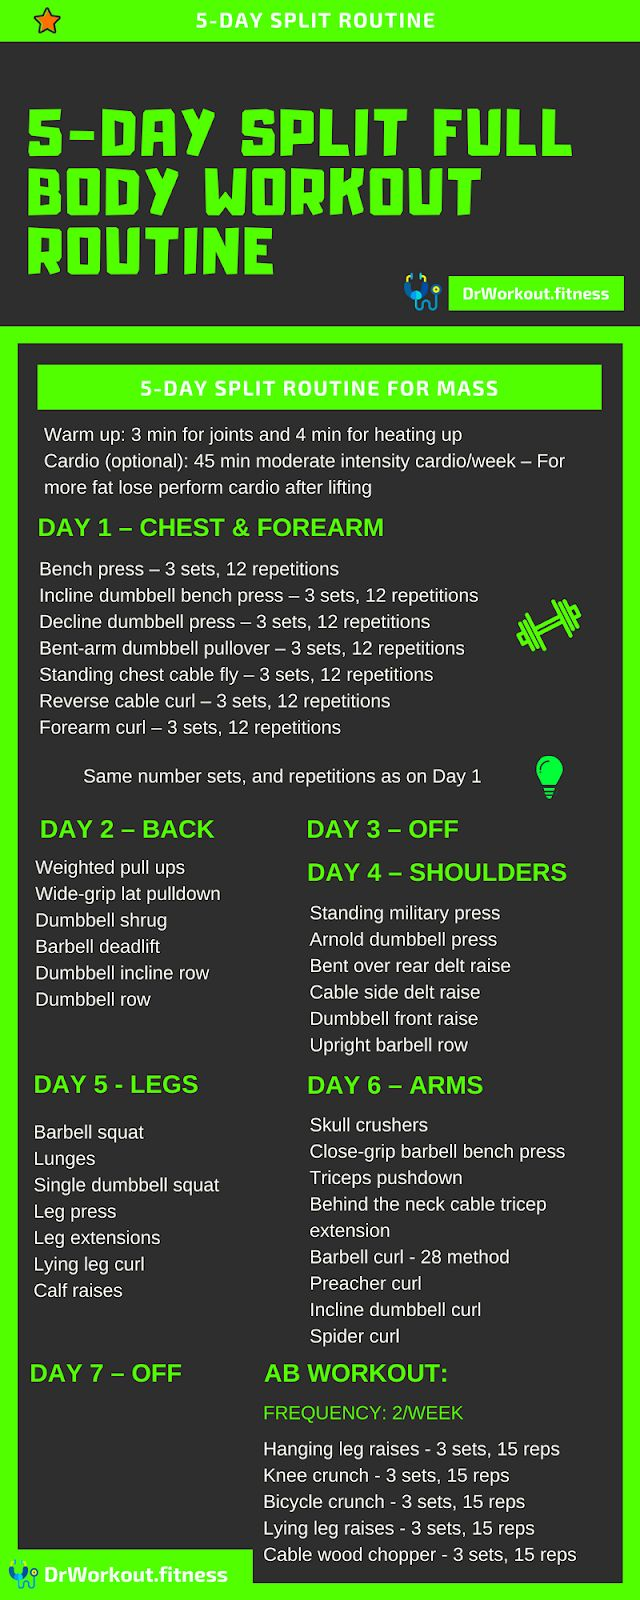 5 Day Split Full Body Workout Routine | 5 Day Workout Plan ...